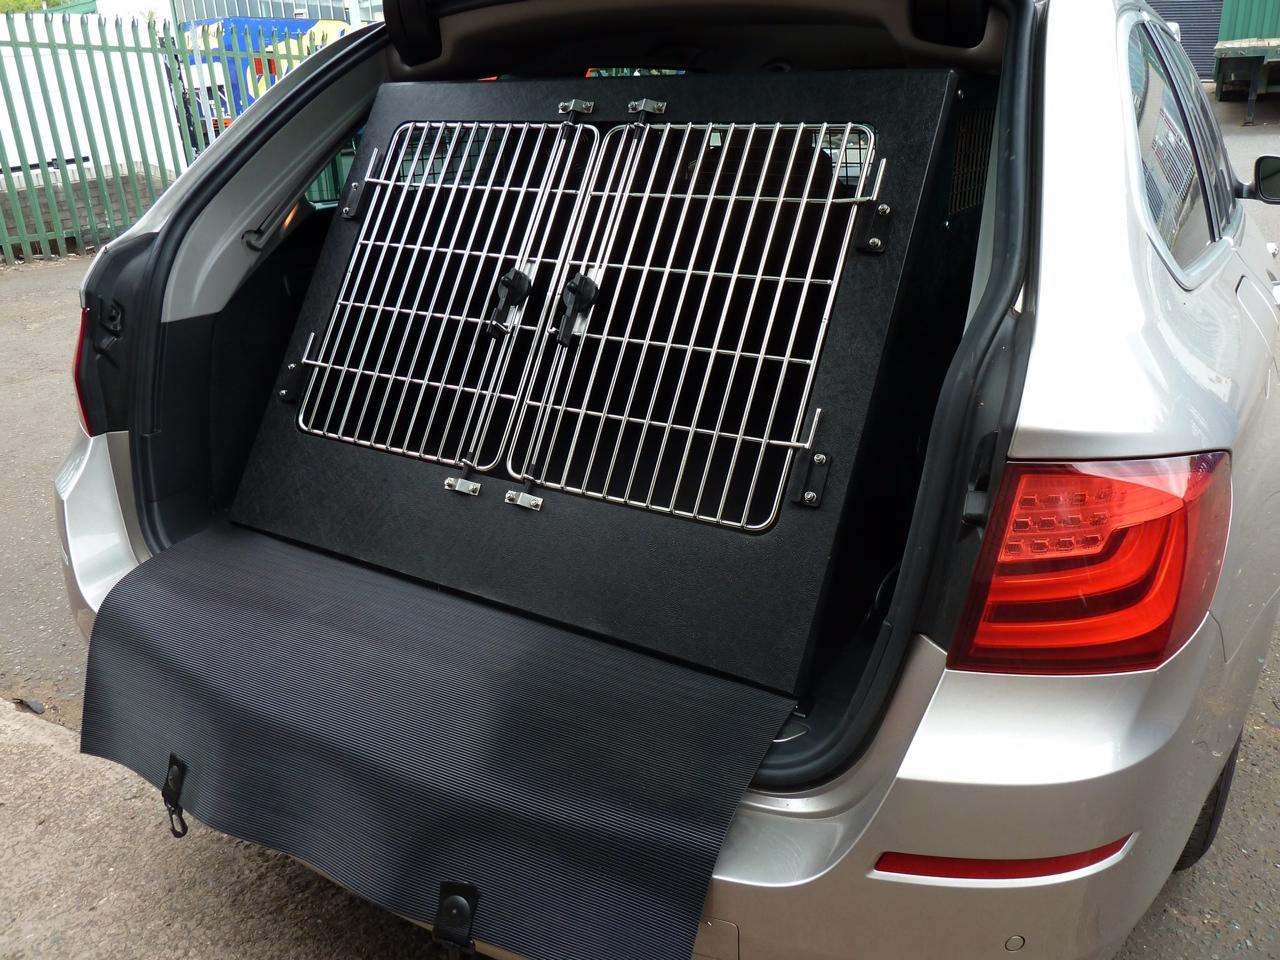 Small/medium Dog cage in estate vehicle